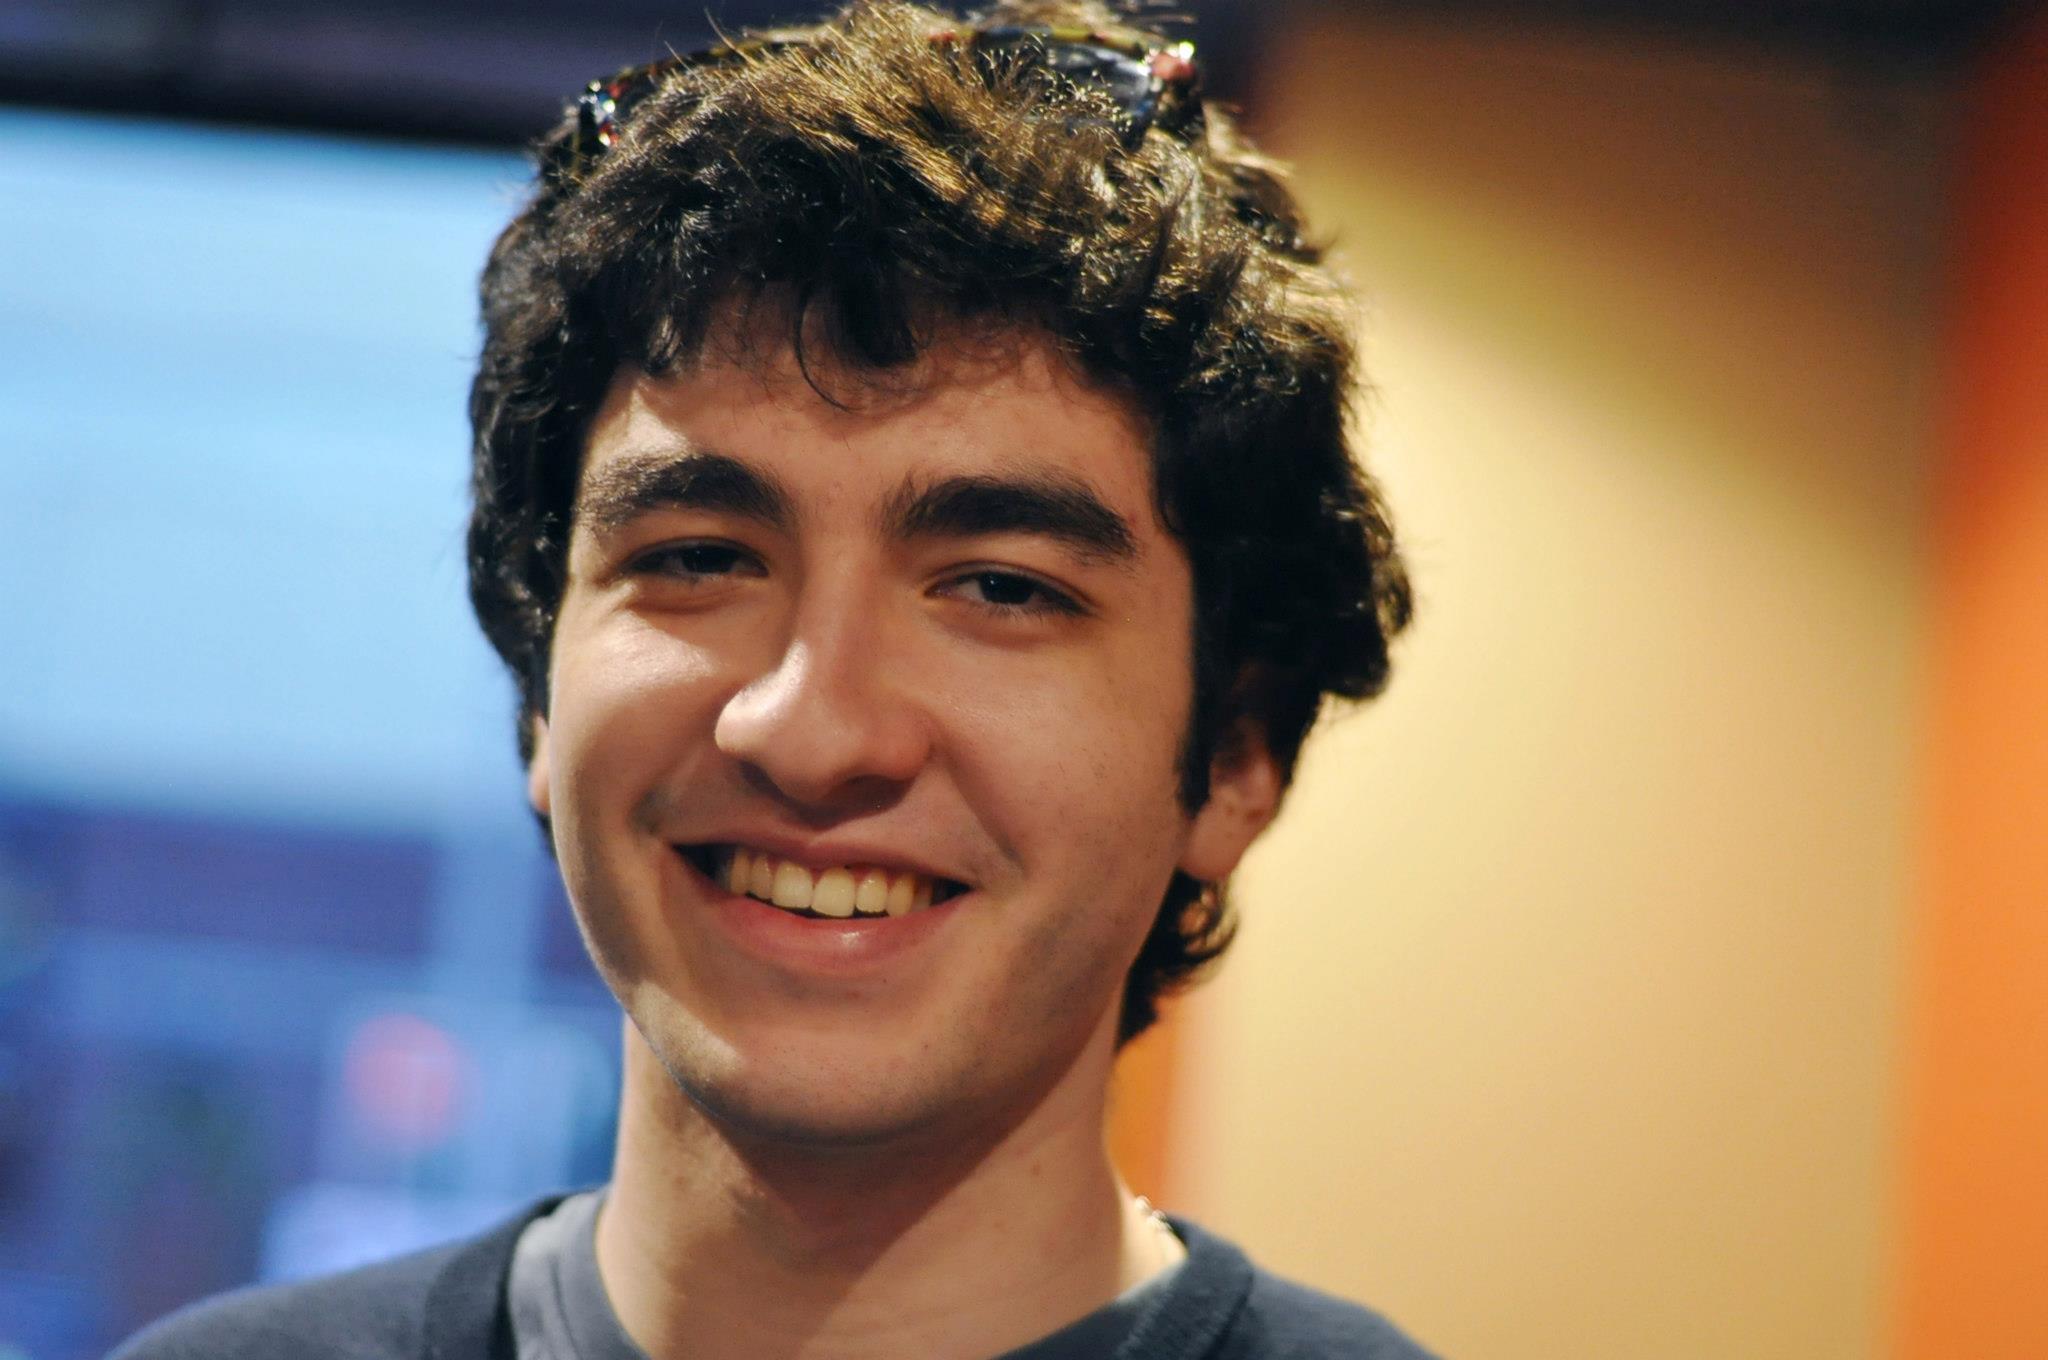 Daniel Moroz